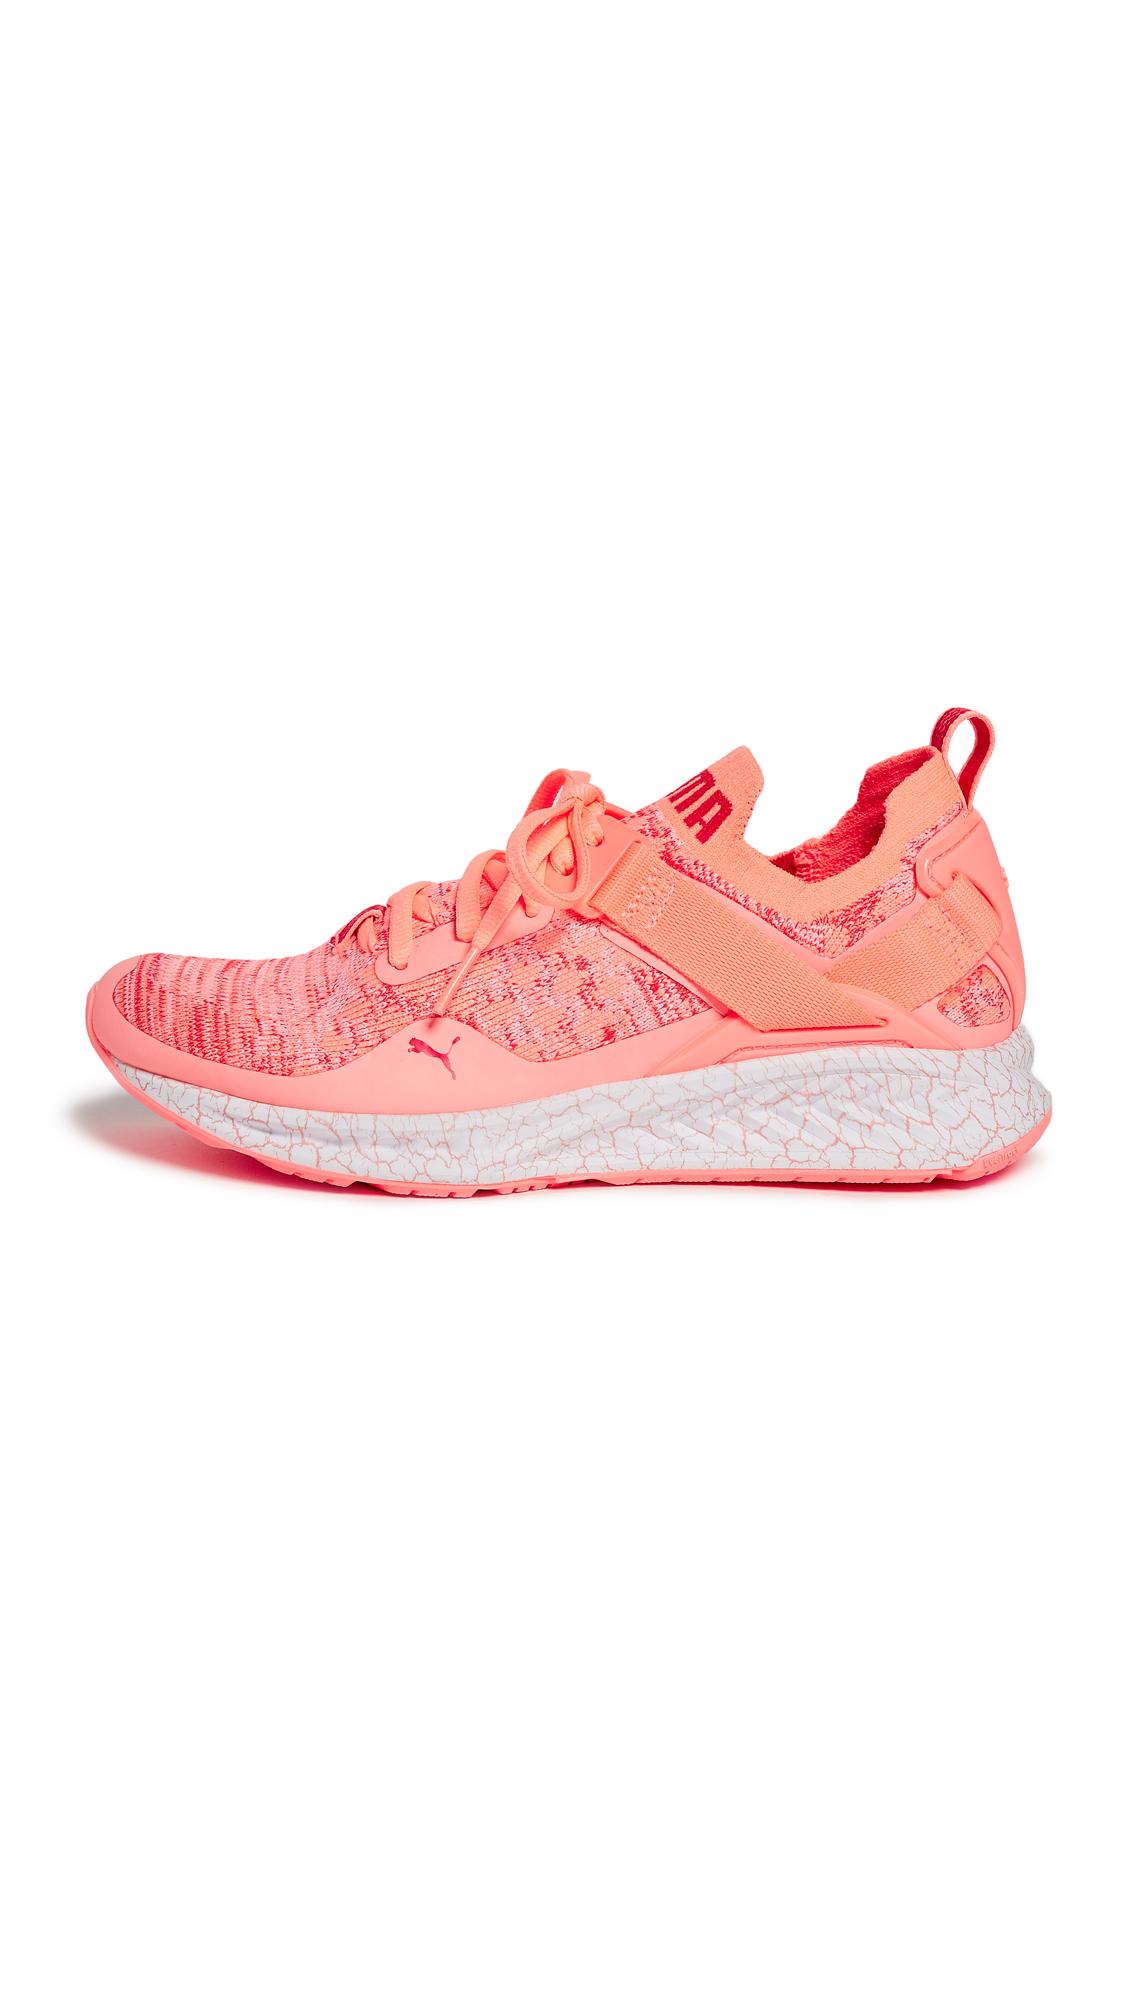 PUMA Ignite evoKNIT Lo Hypernature Sneakers - Light Pink